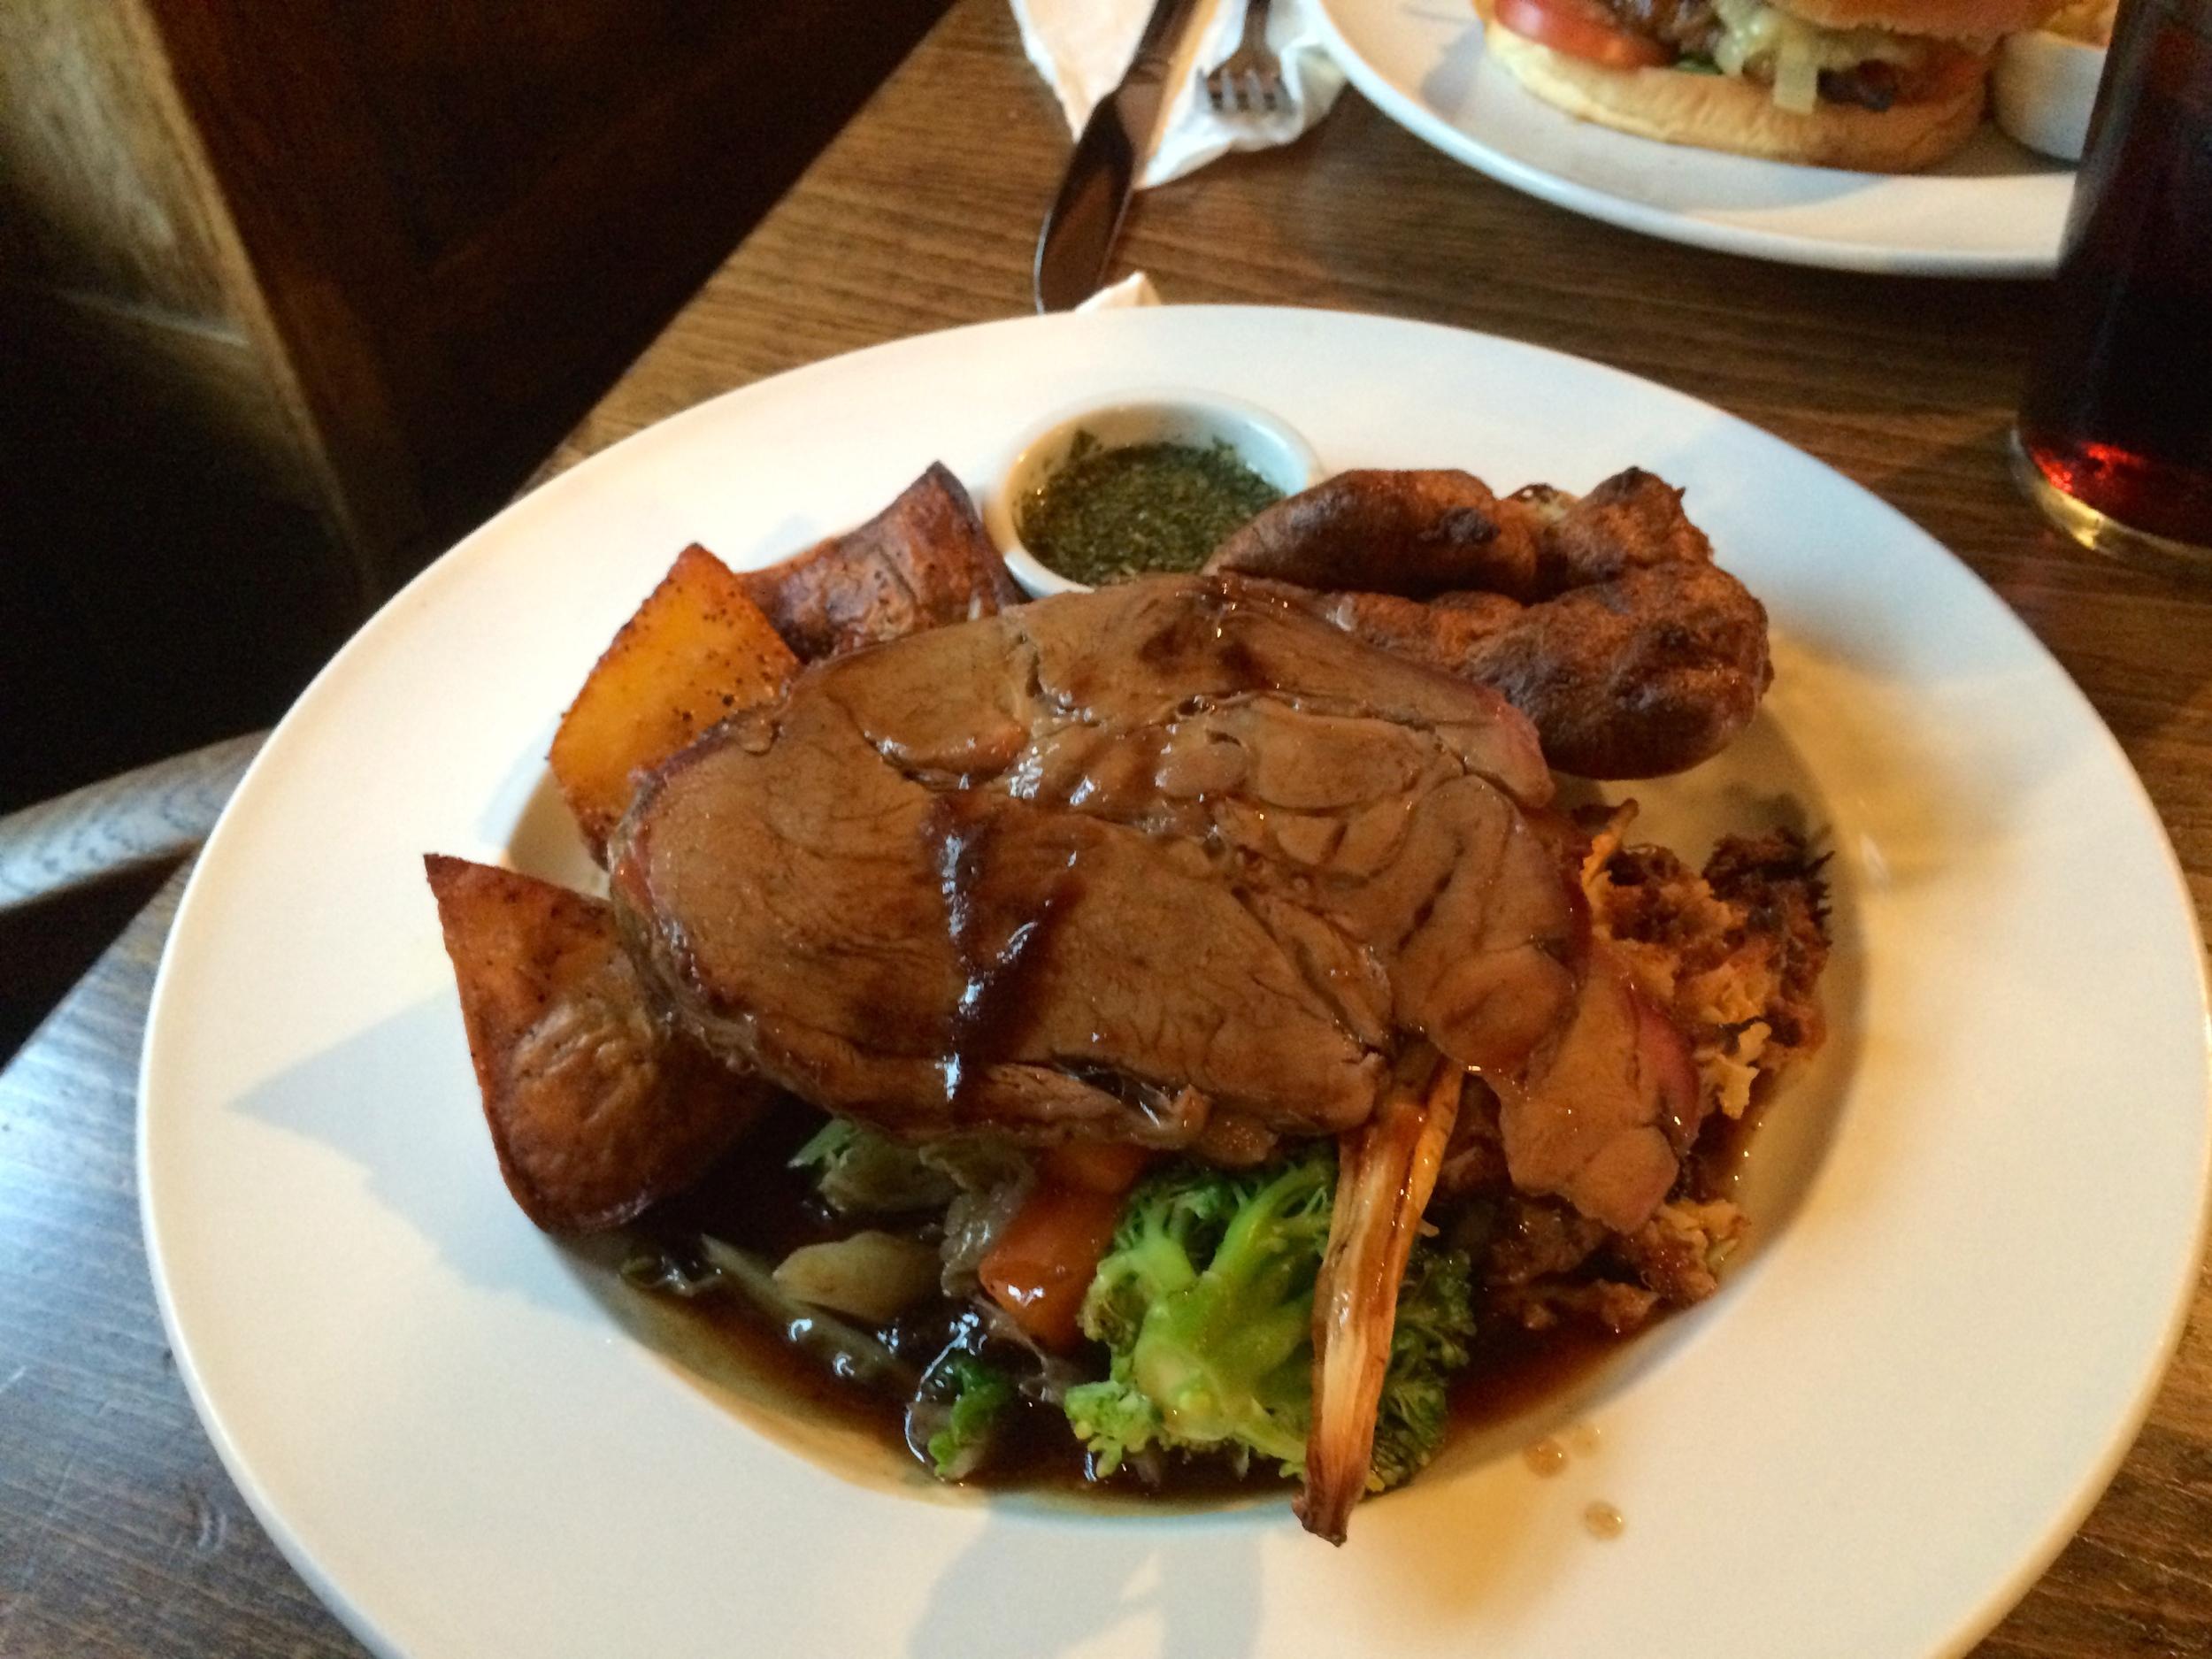 Sunday Roast: Lamb/Mint Edition